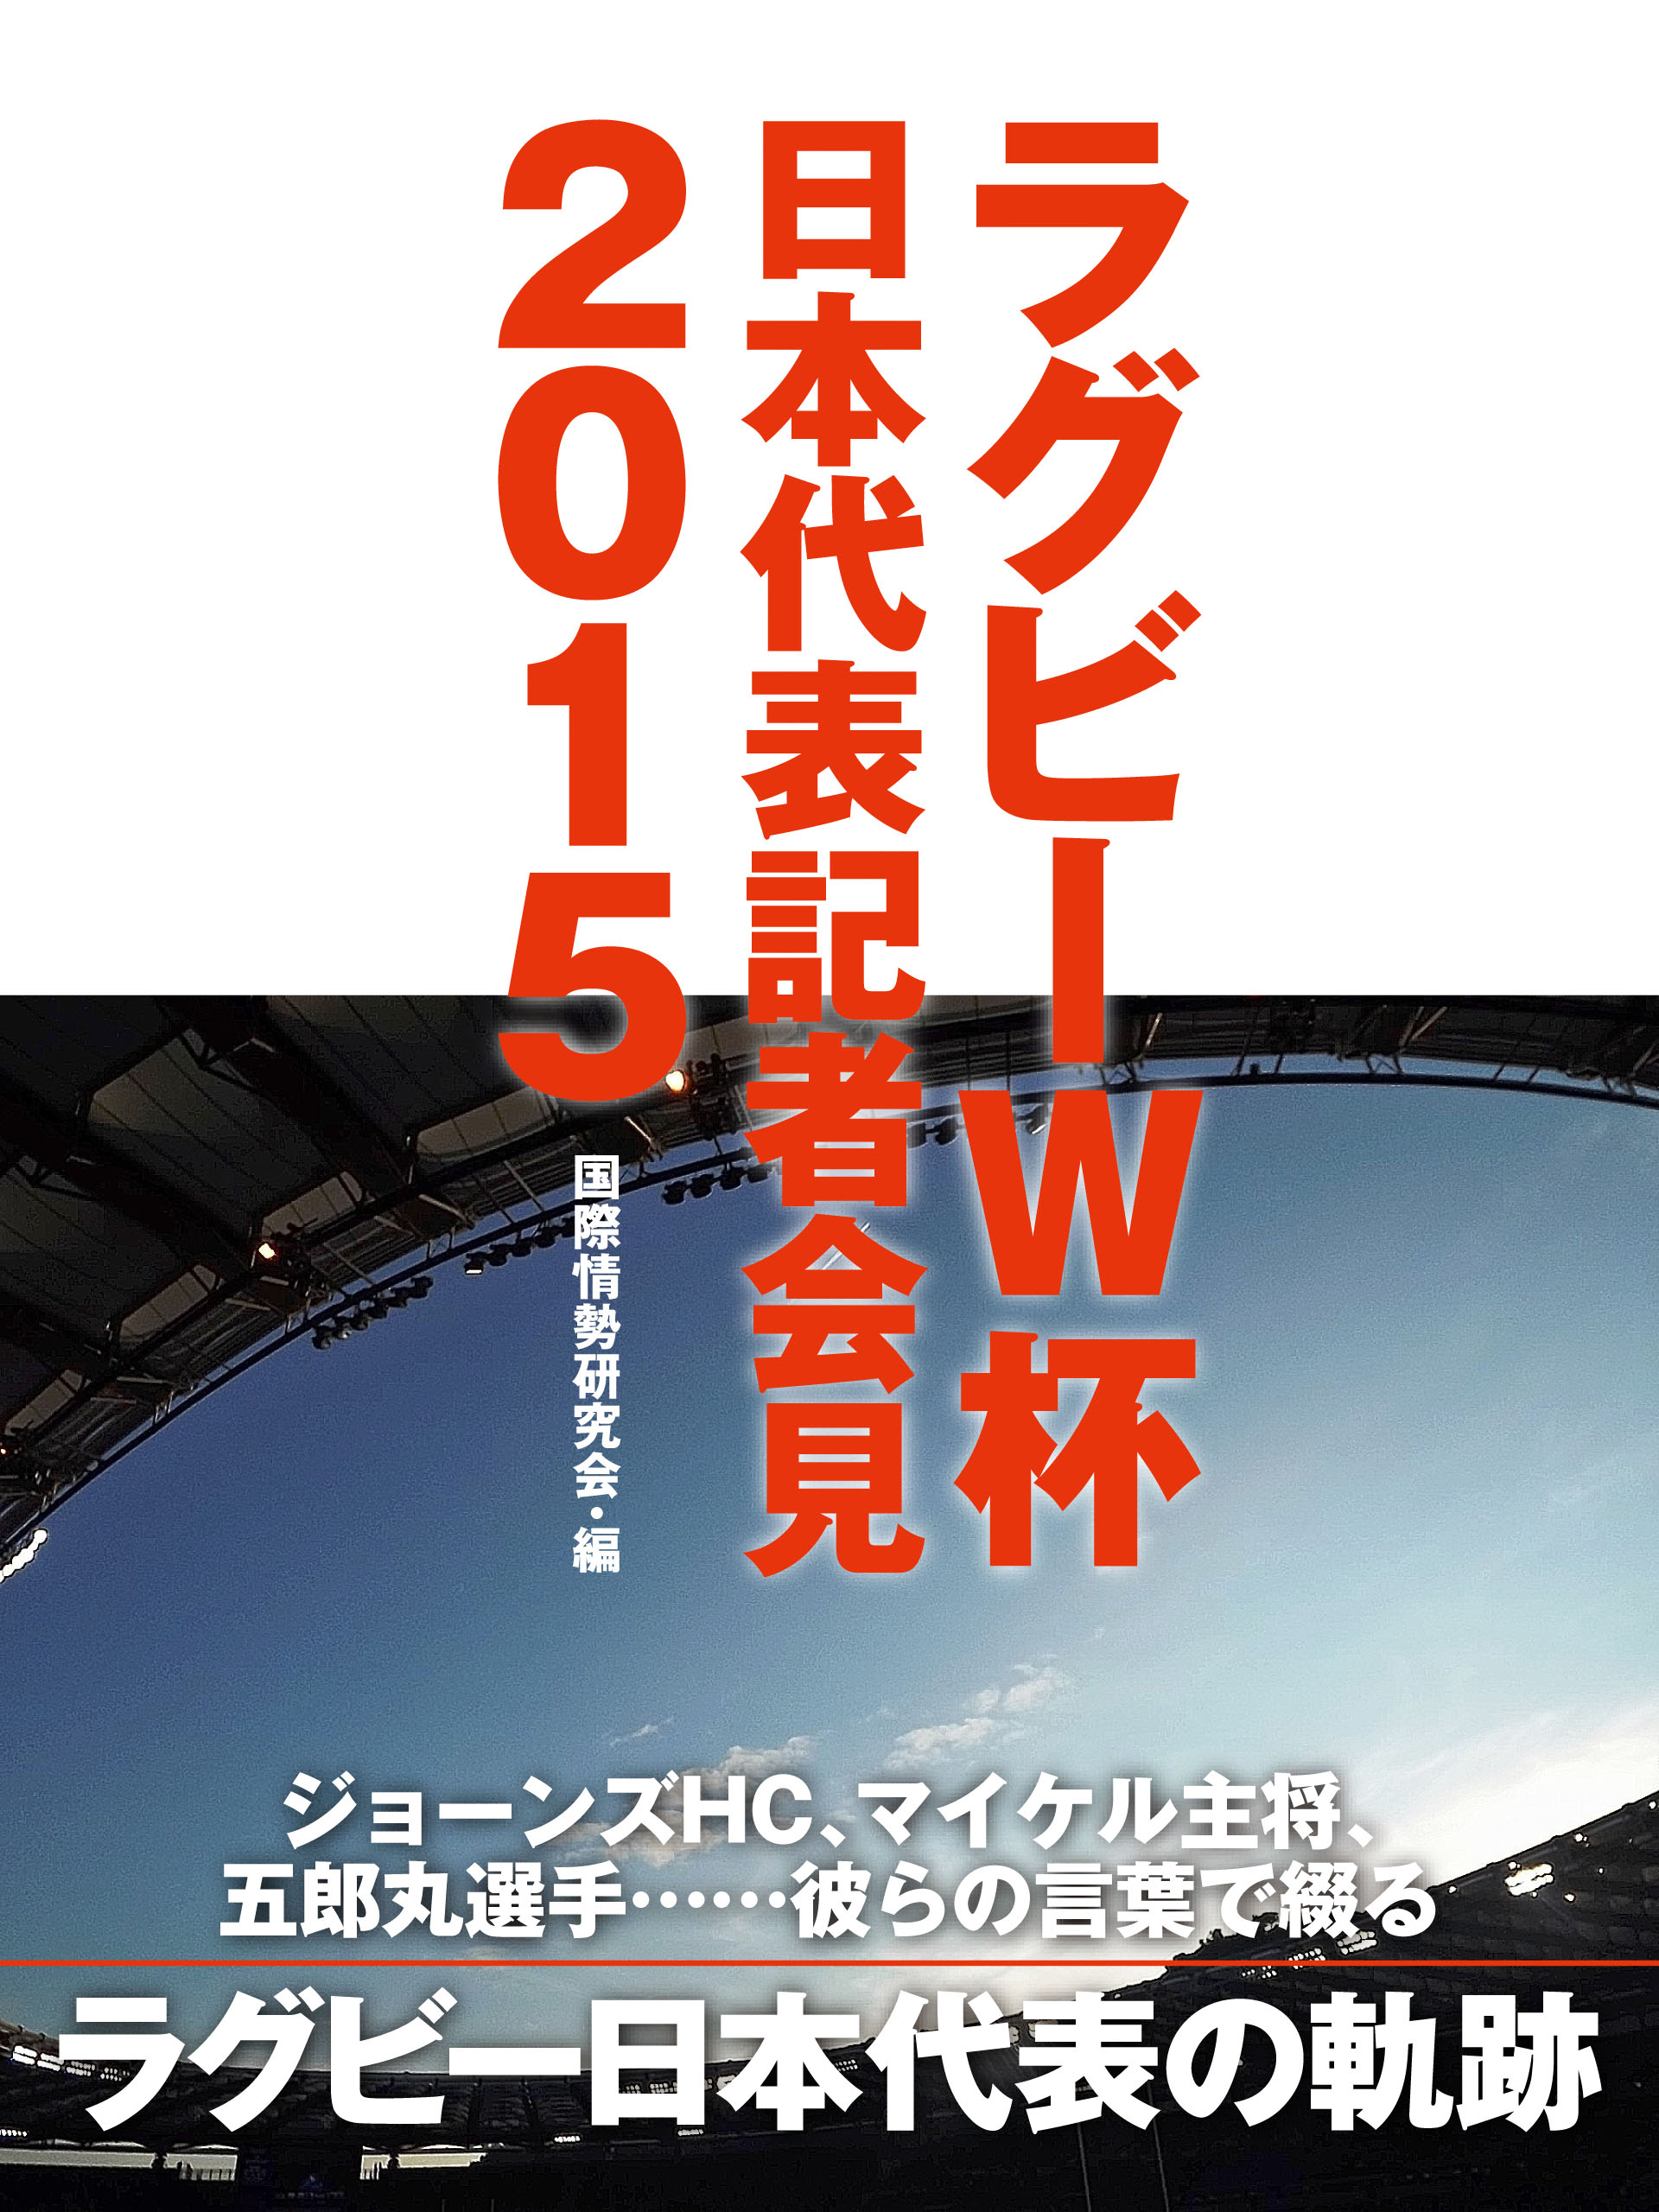 【POD版】エディHC、五郎丸選手、マイケル主将・・・・・・彼らの言葉で綴るラグビーW杯日本代表記者会見2015